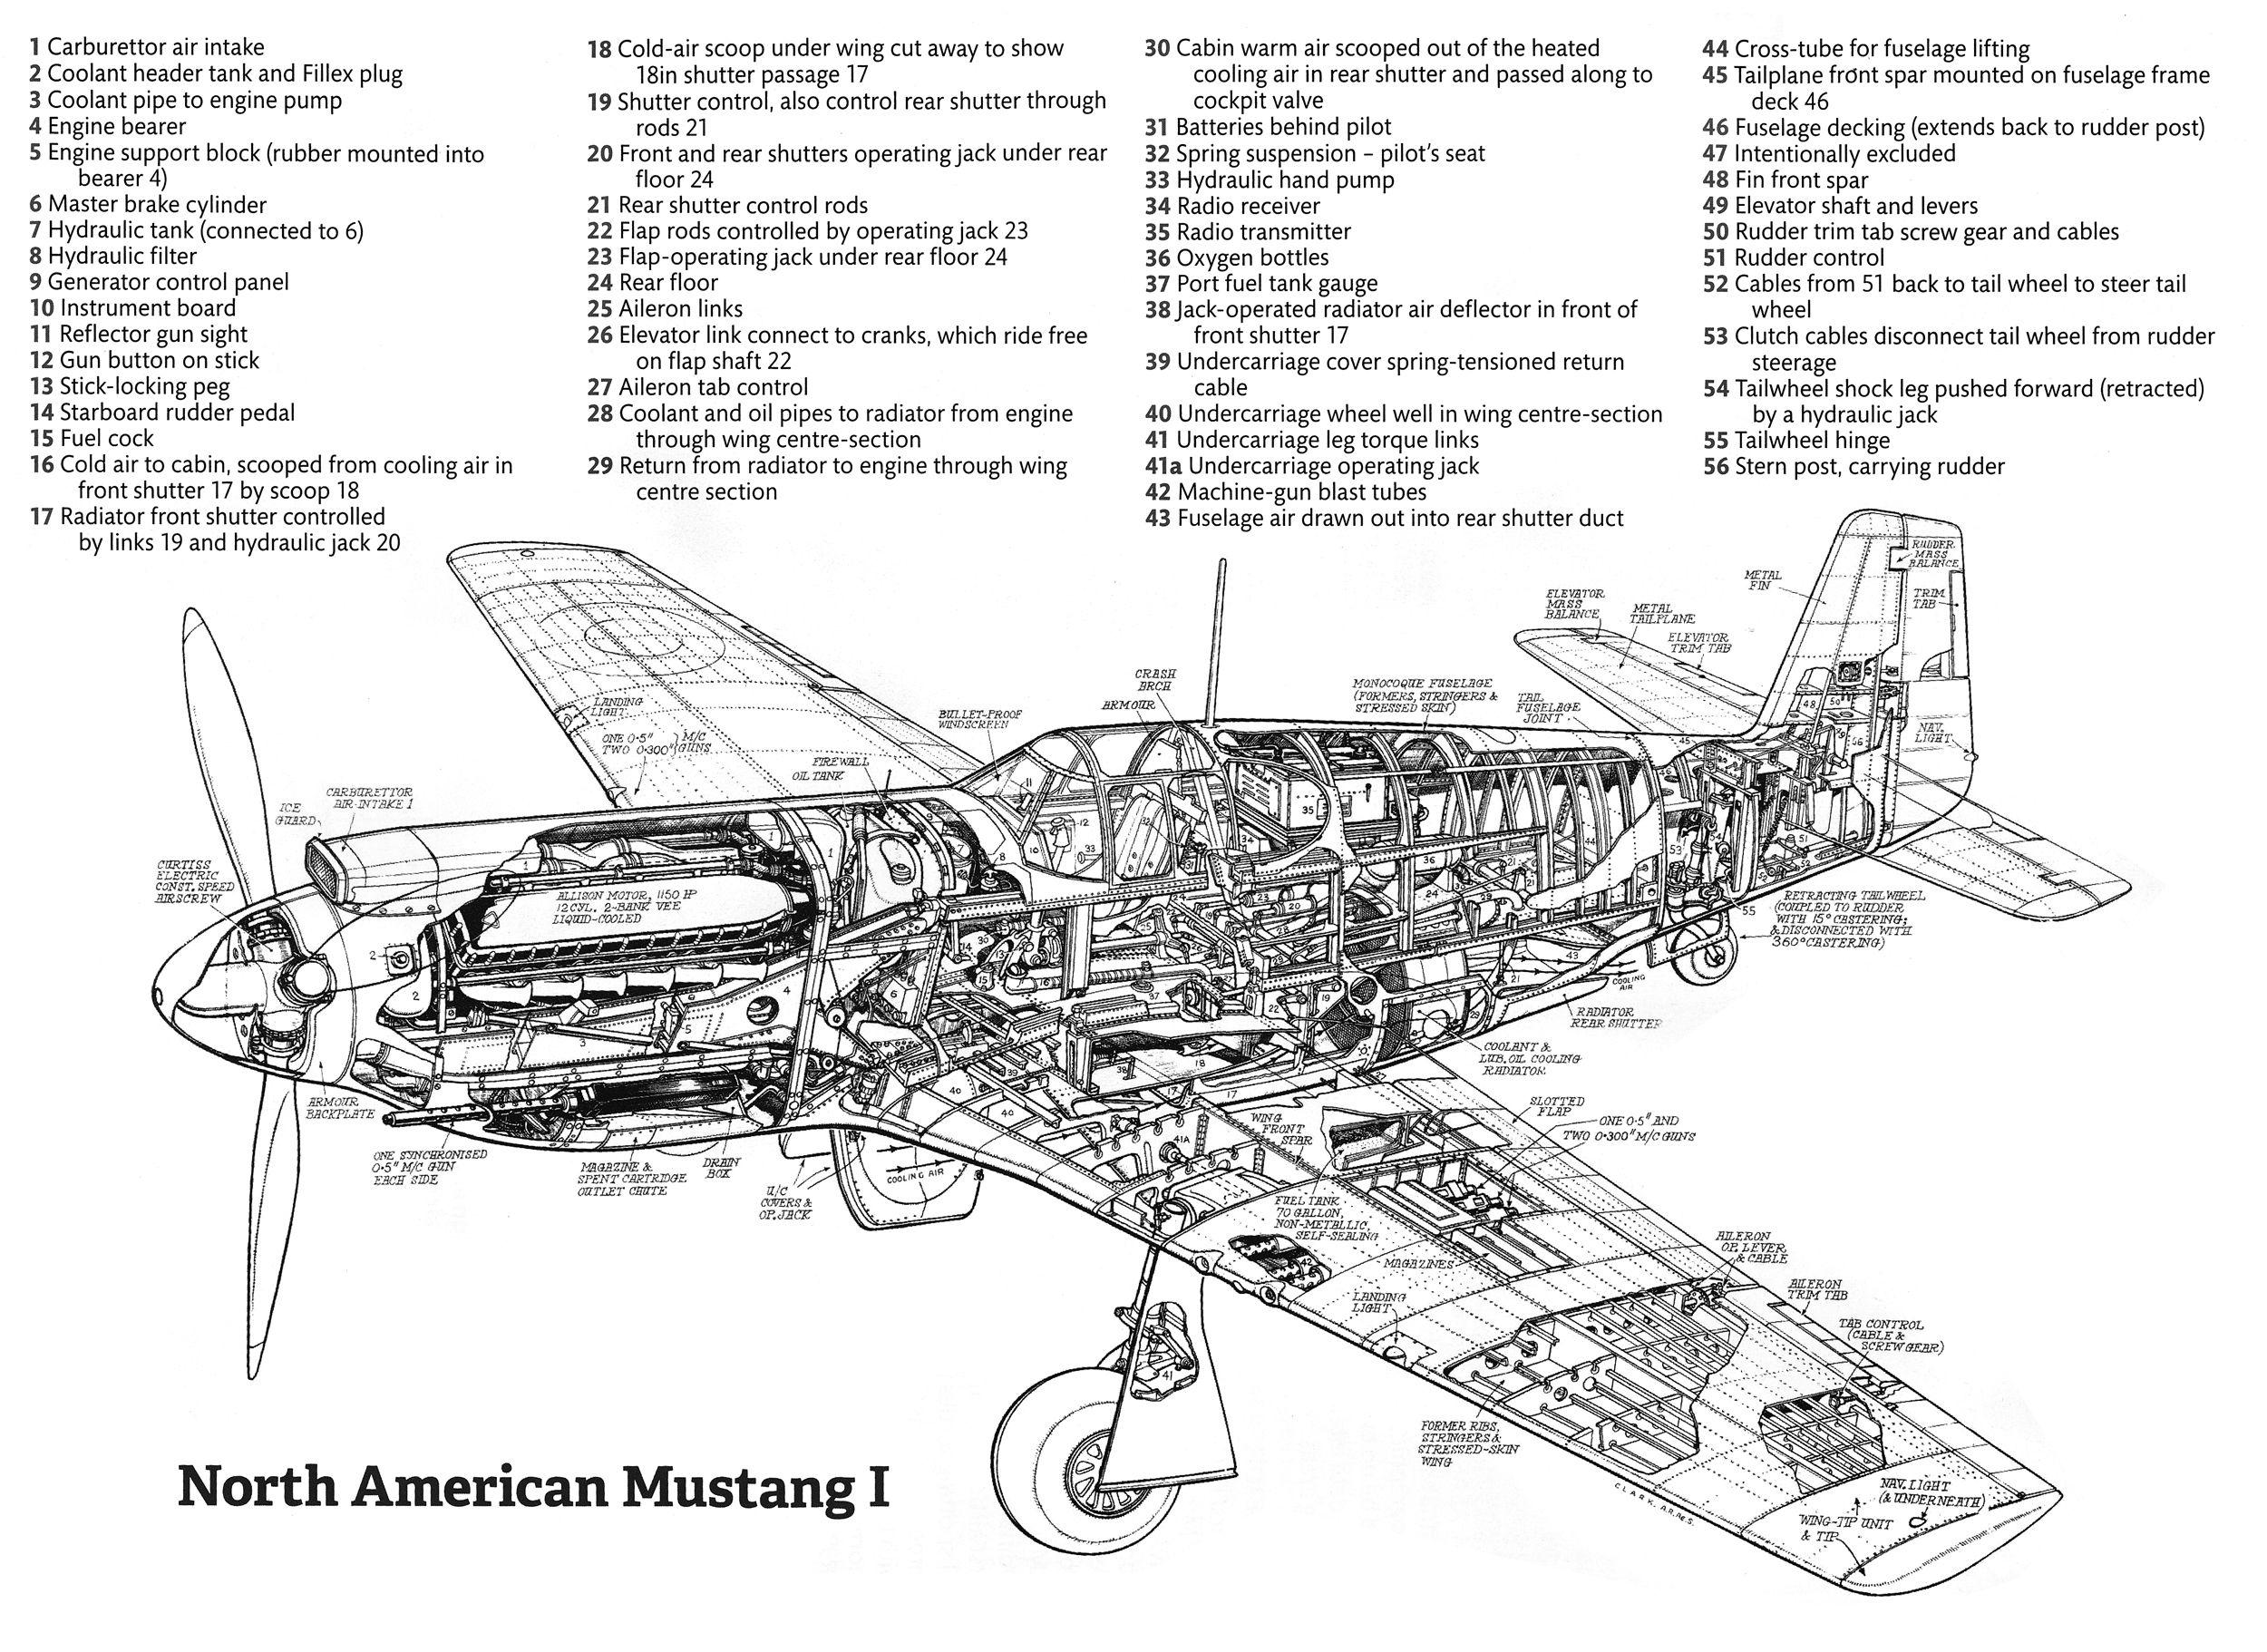 North American P51a Mustang Cutaway